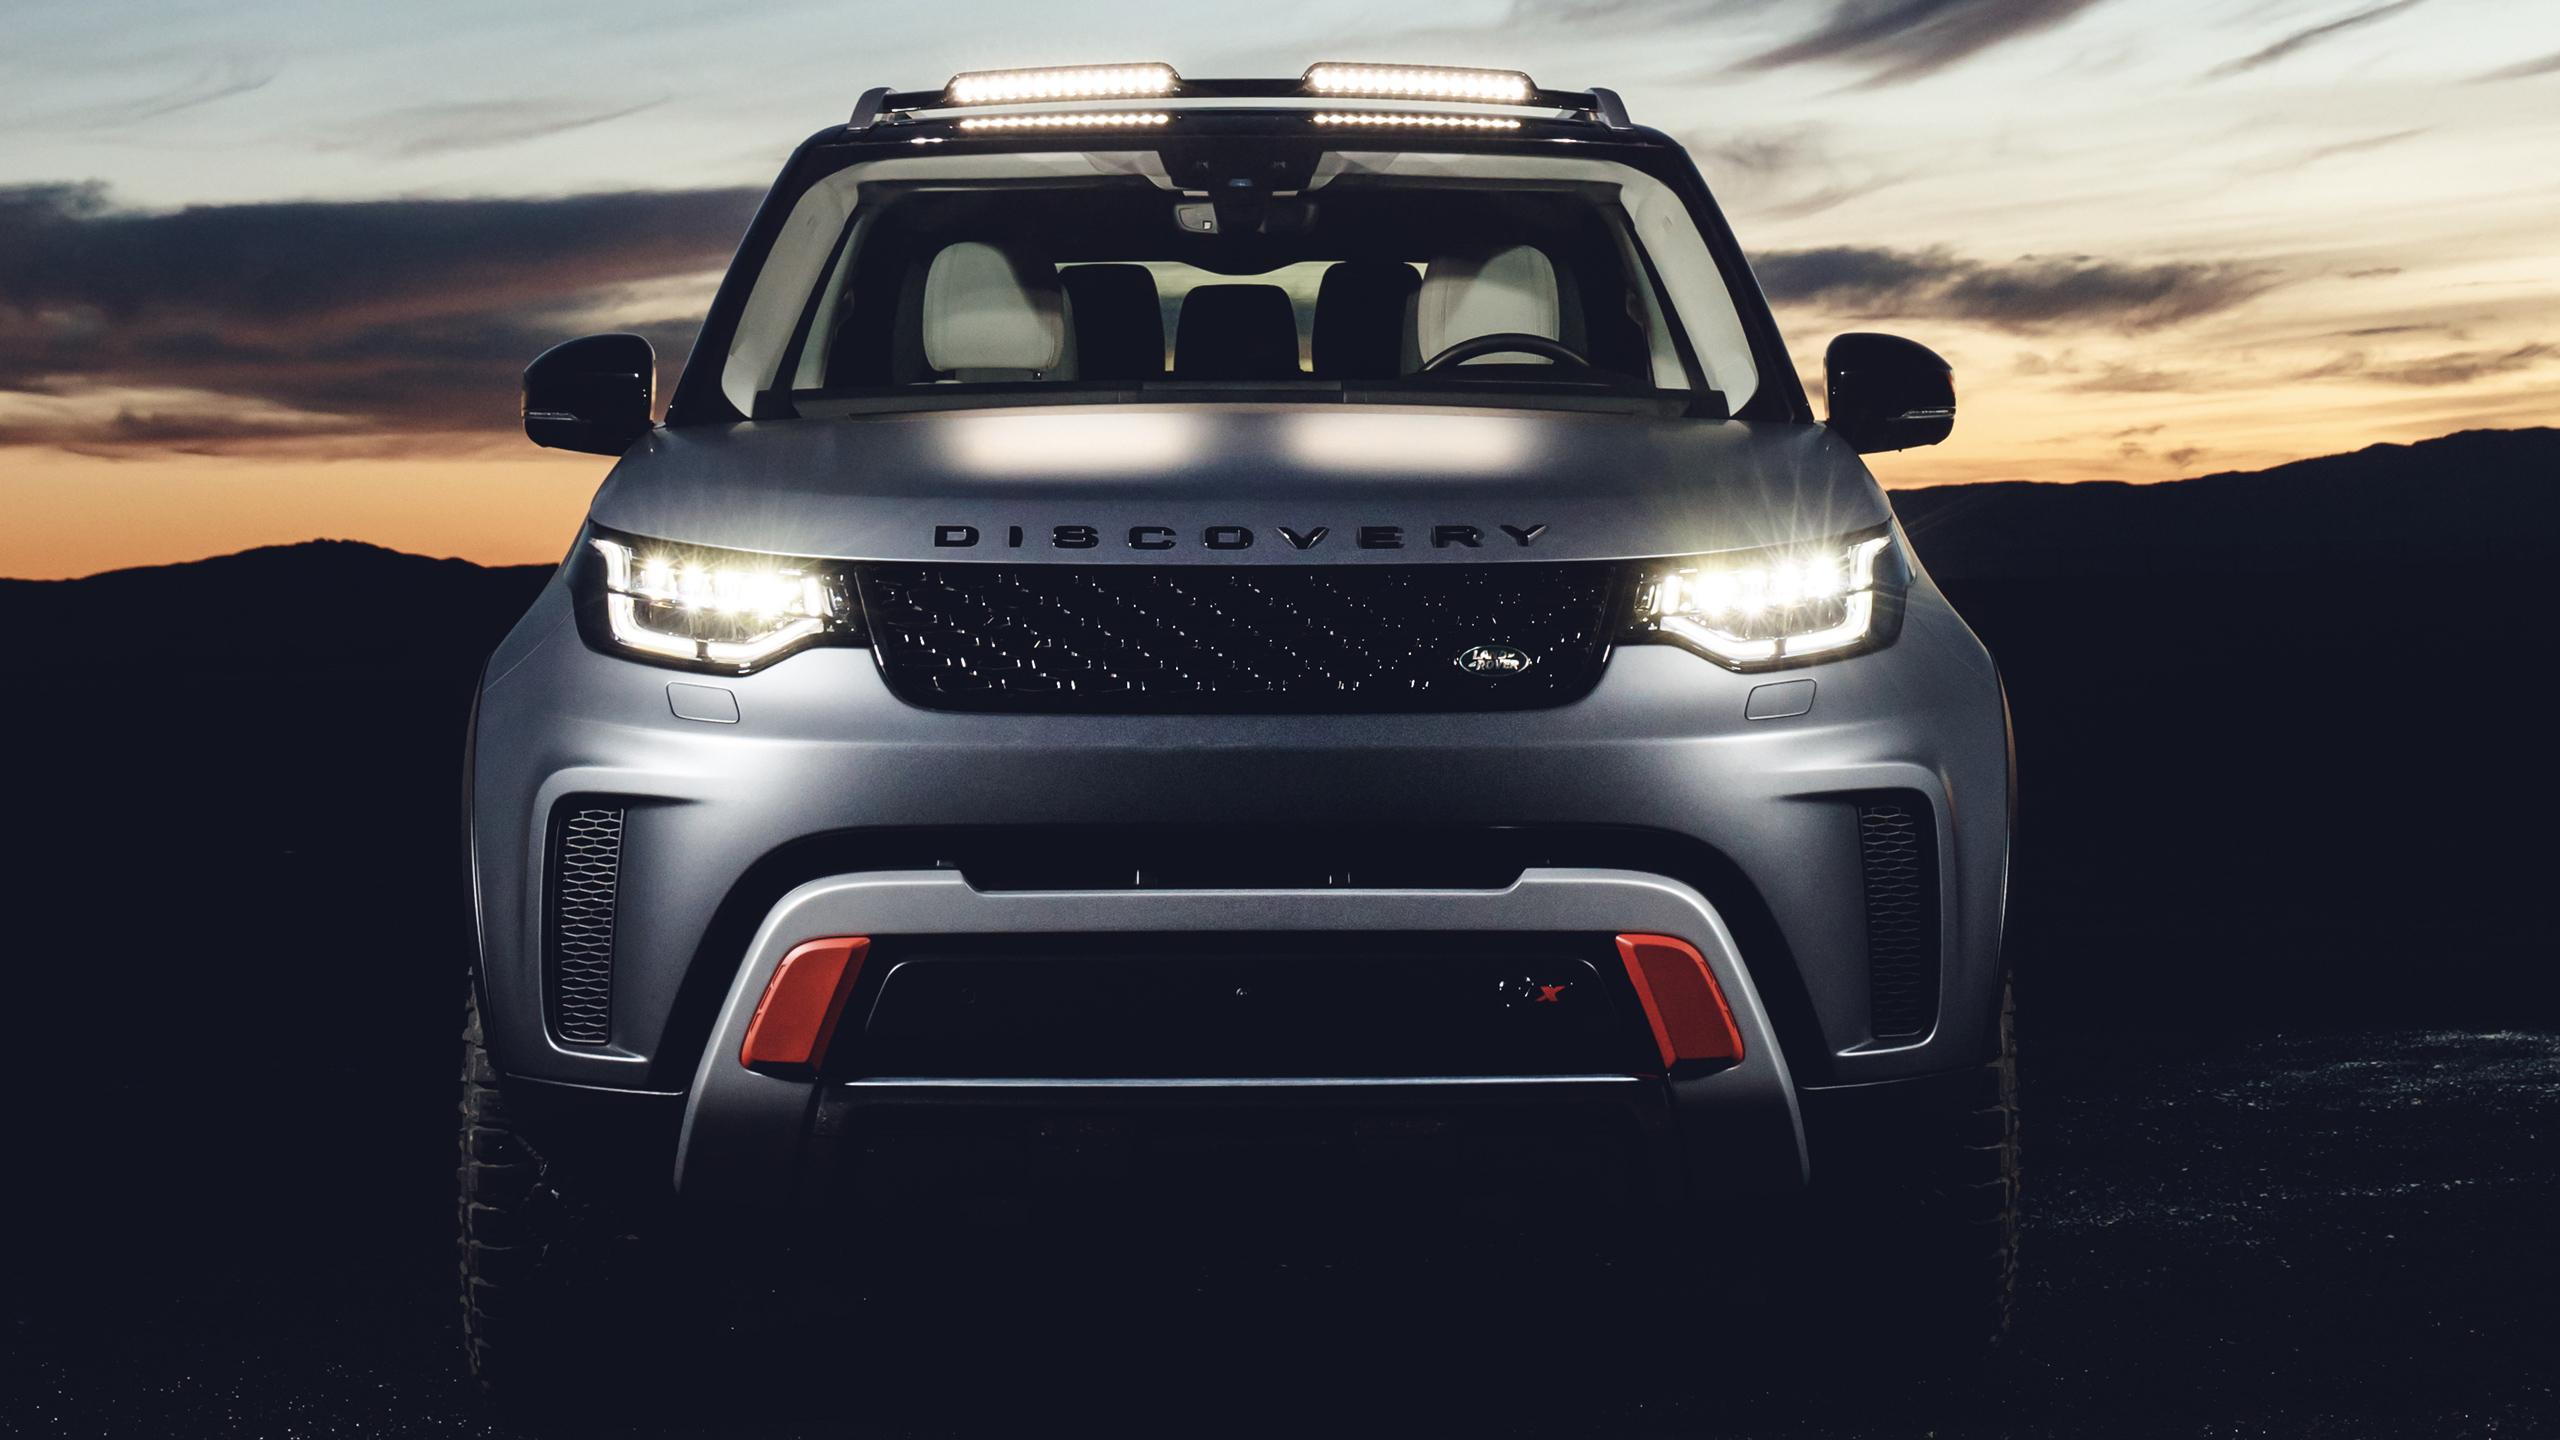 2018 Land Rover Discovery SVX Wallpaper | HD Car ...